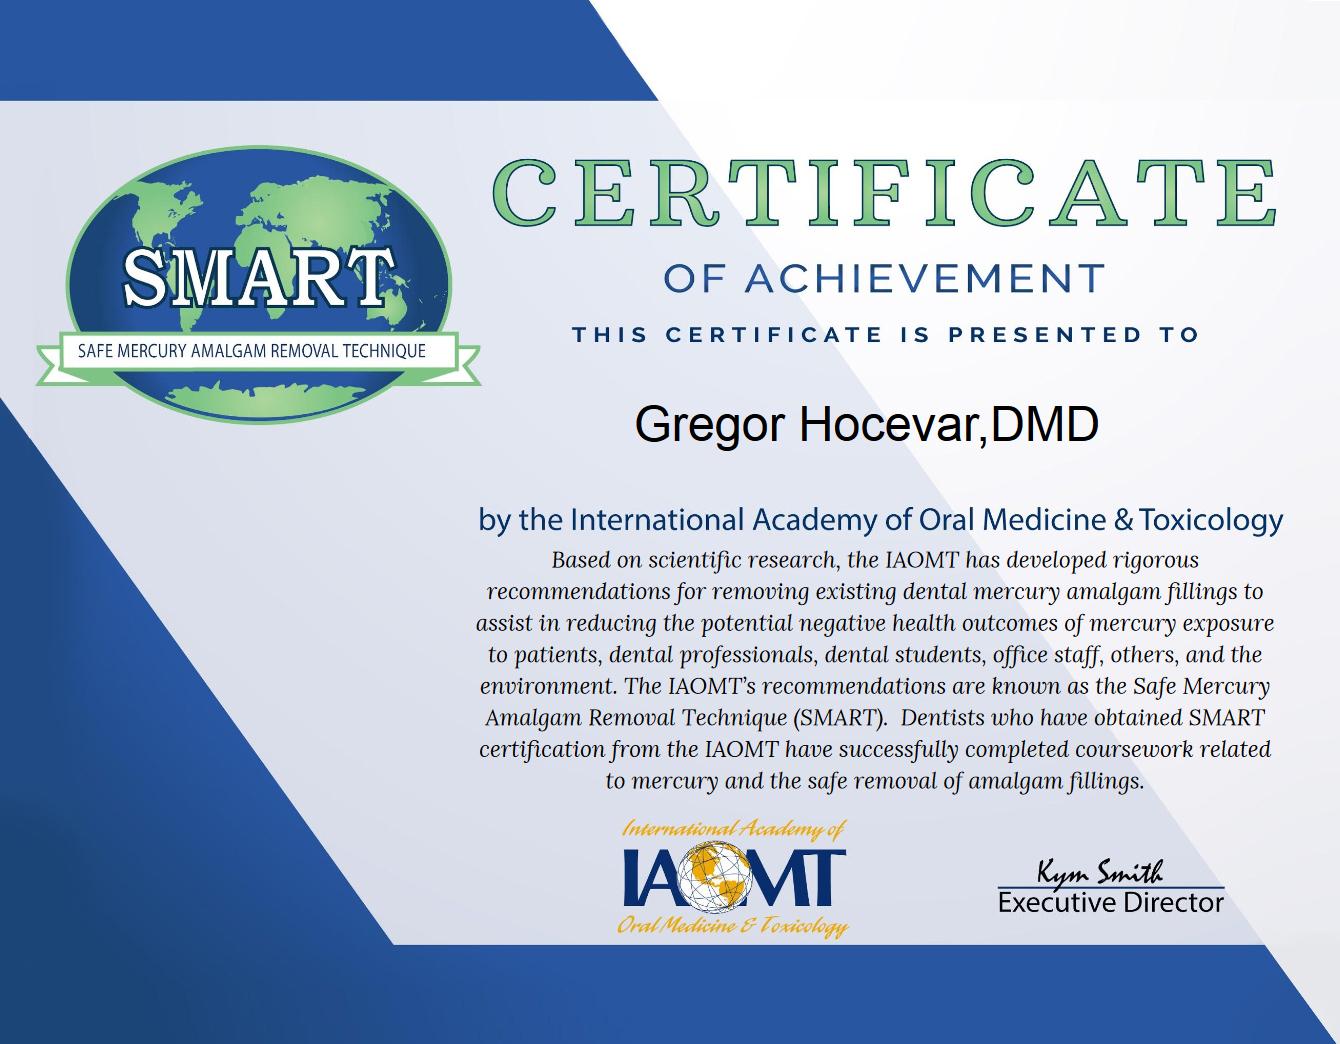 Certifikat smart